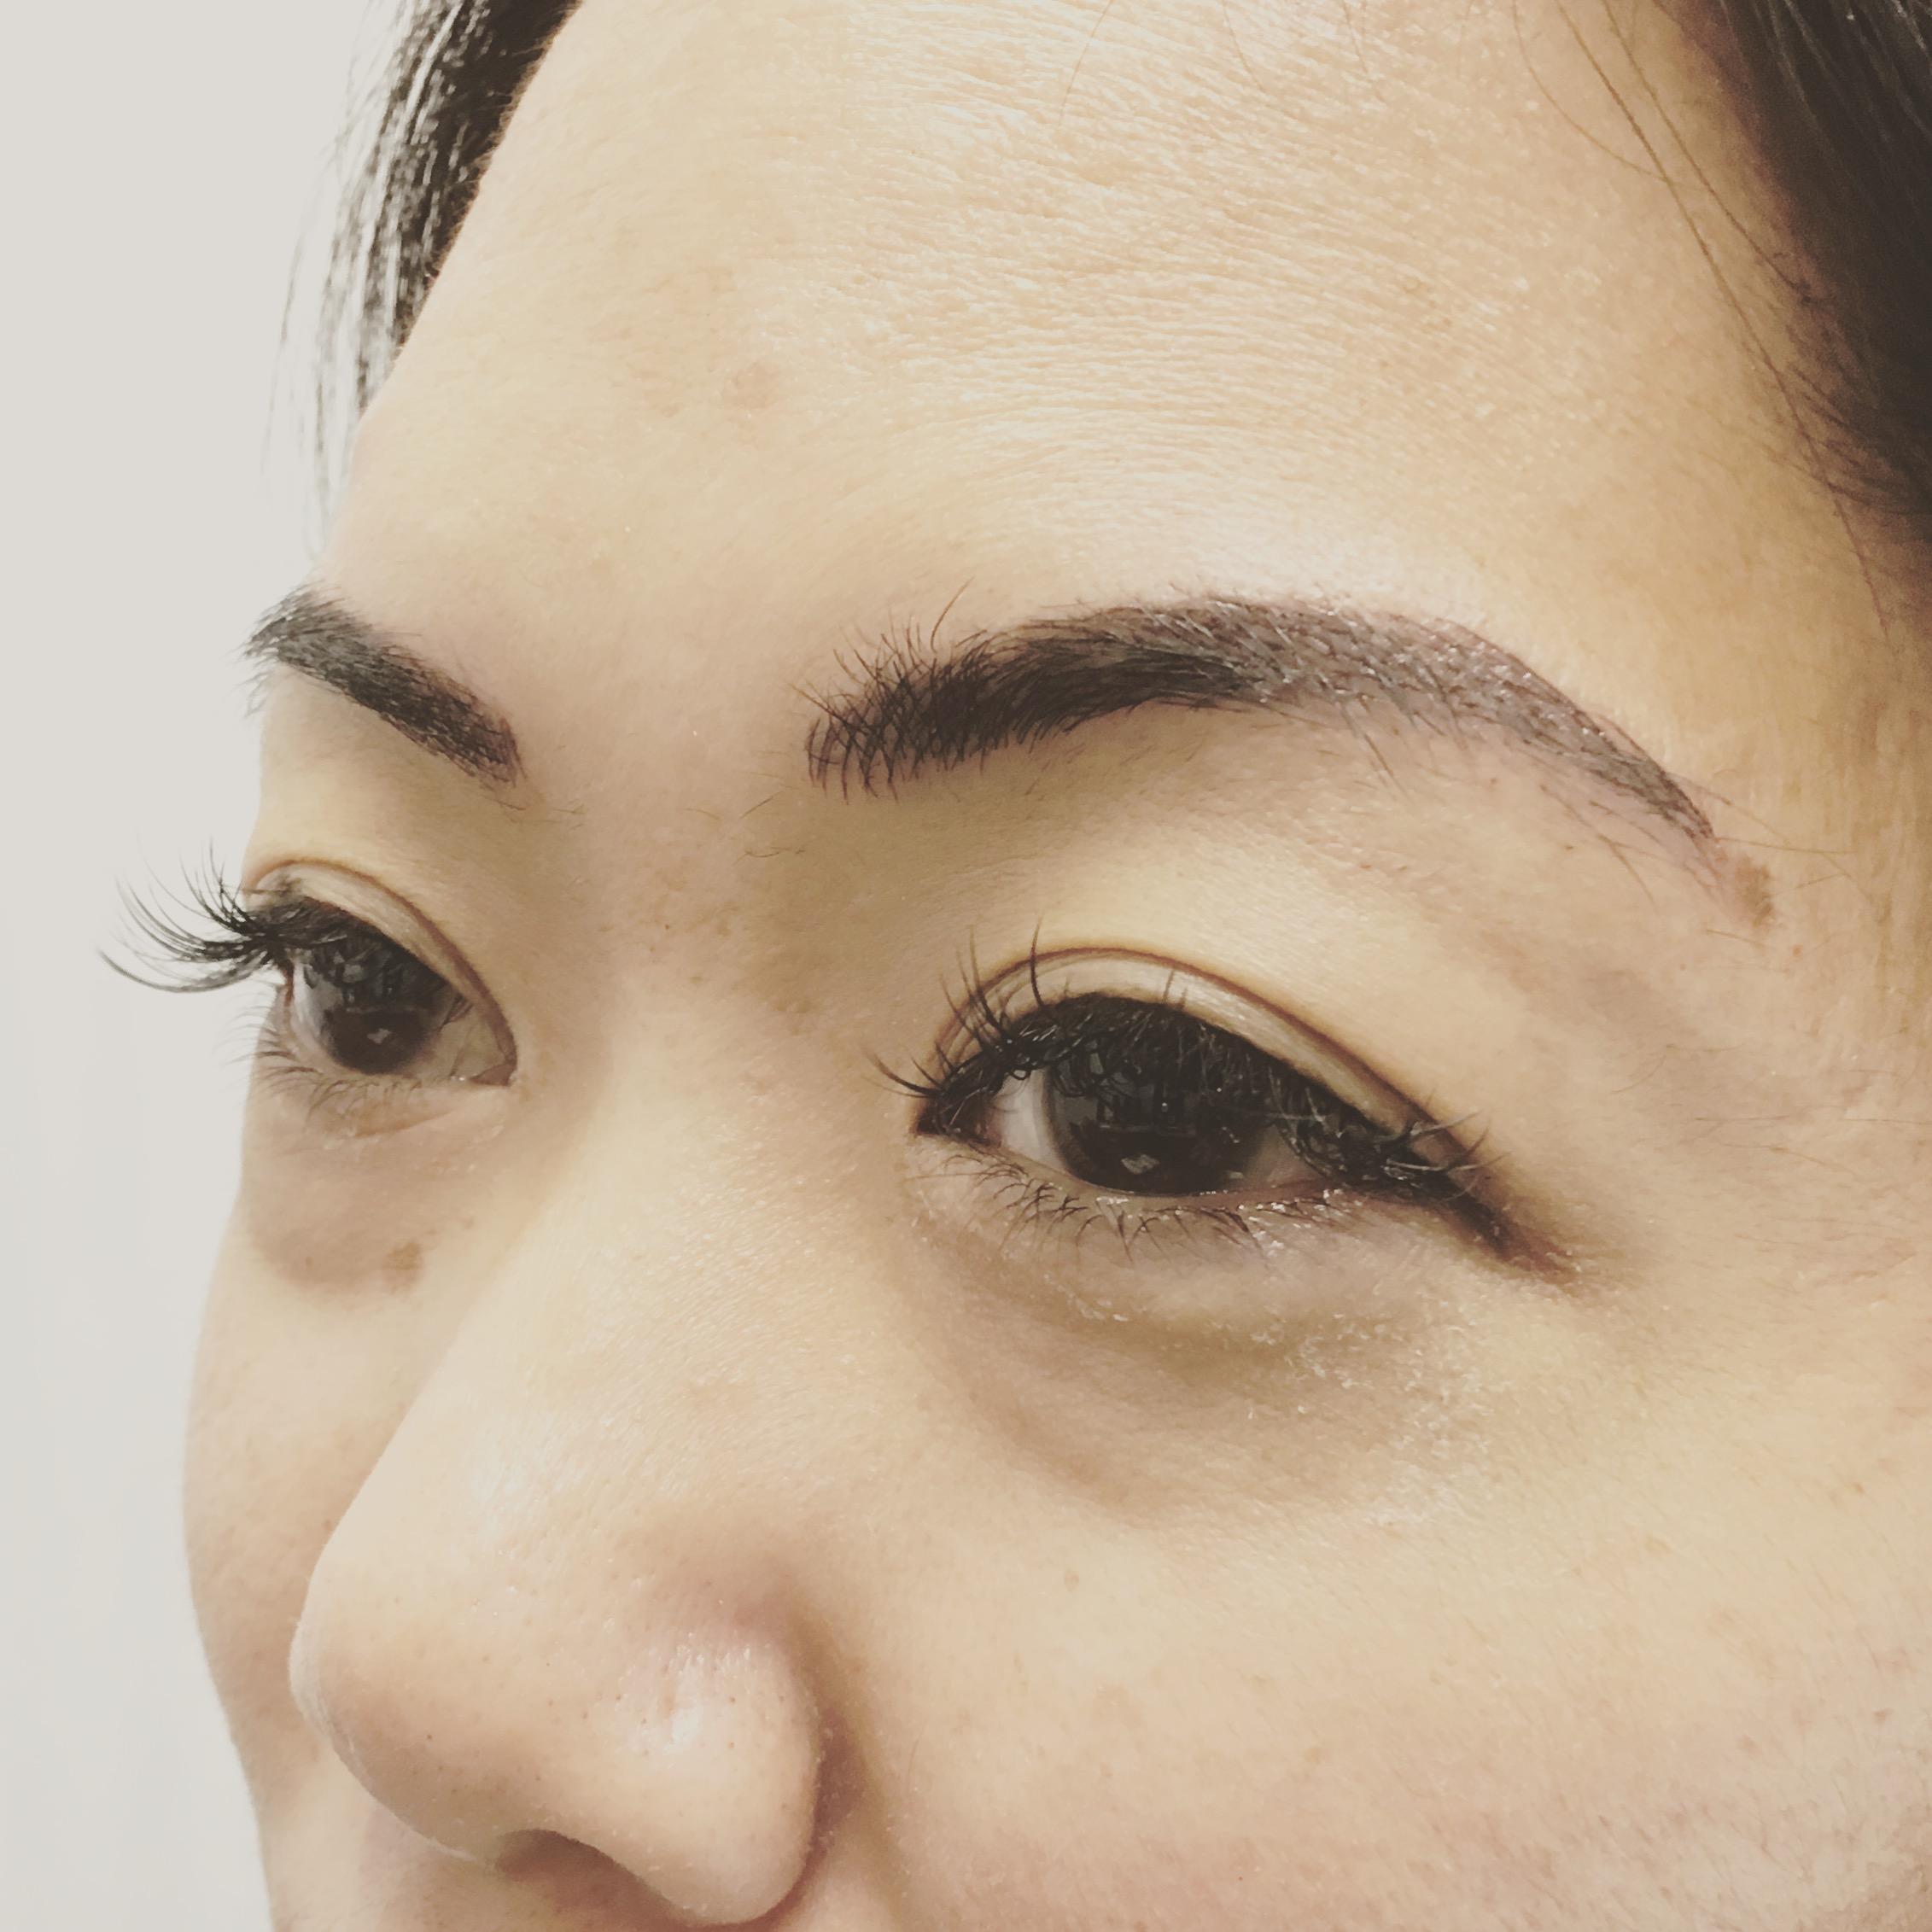 Eye's Eyebrow Microblading Results